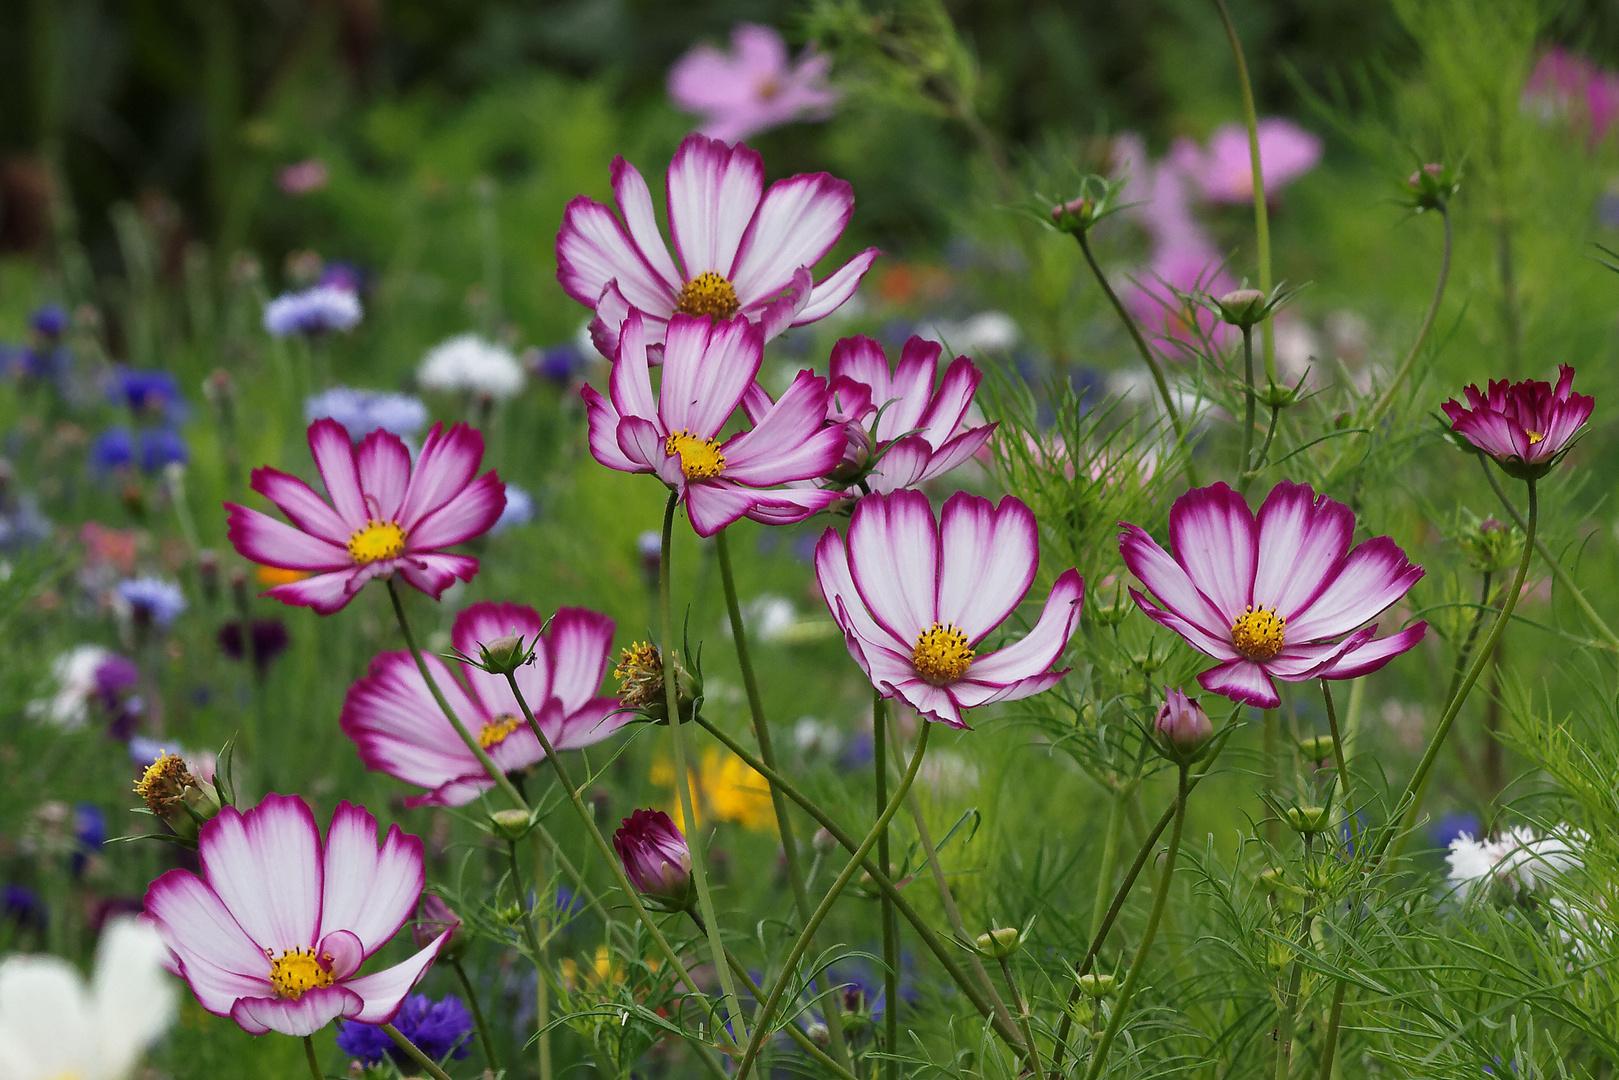 jach re fleurie photo et image fleurs nature images. Black Bedroom Furniture Sets. Home Design Ideas